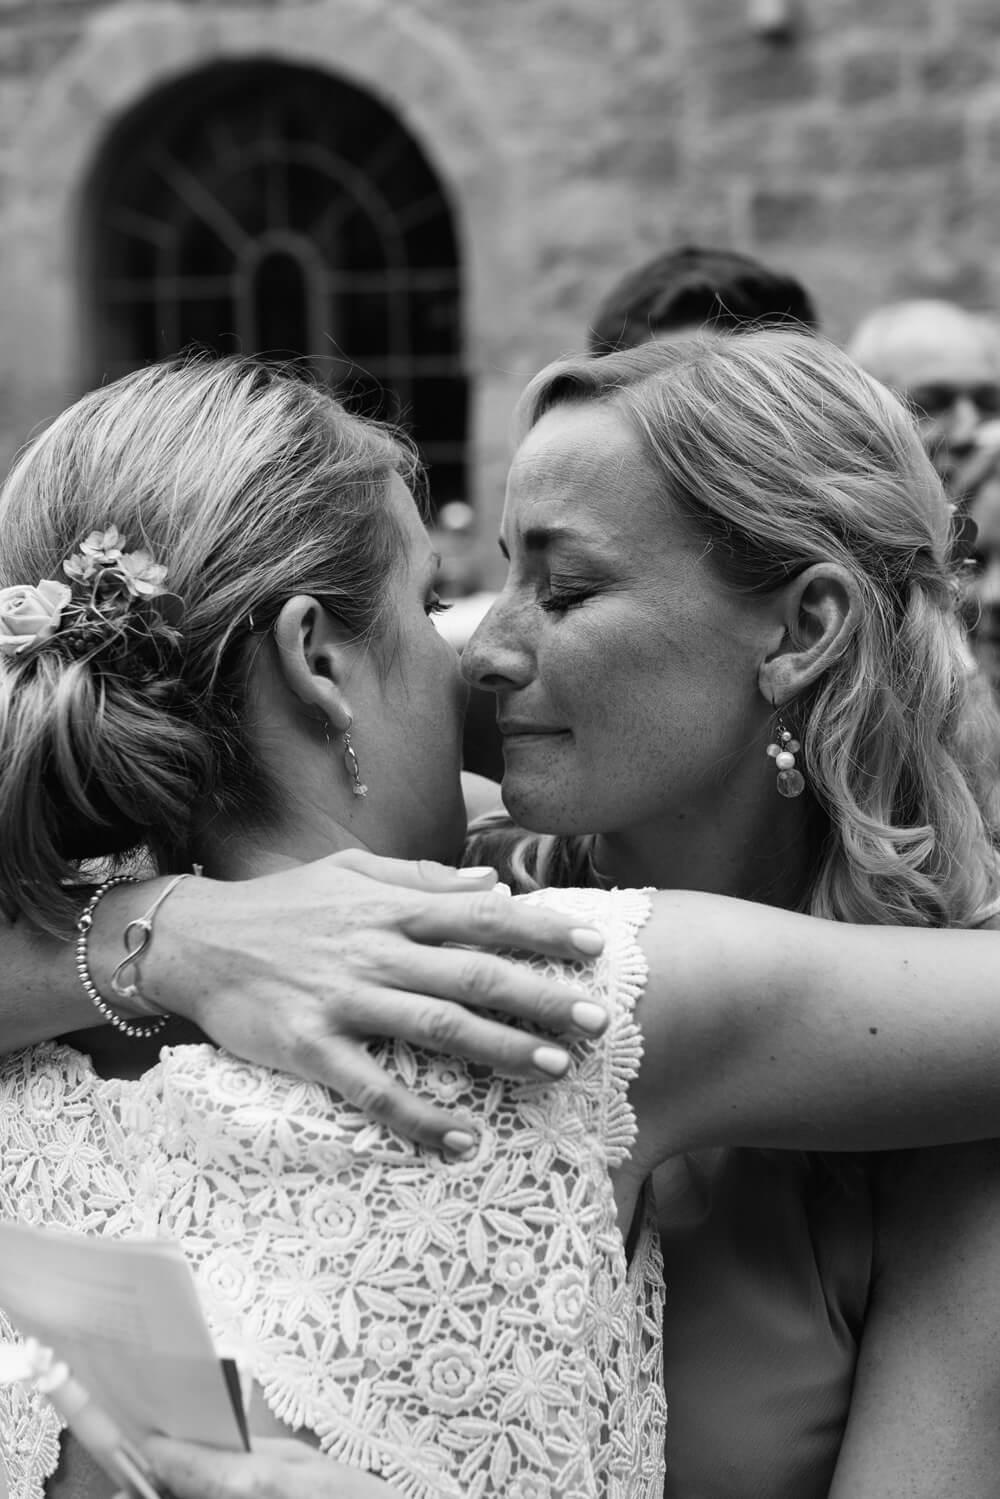 Gast gratuliert der Braut. Trauung Osnabrück.